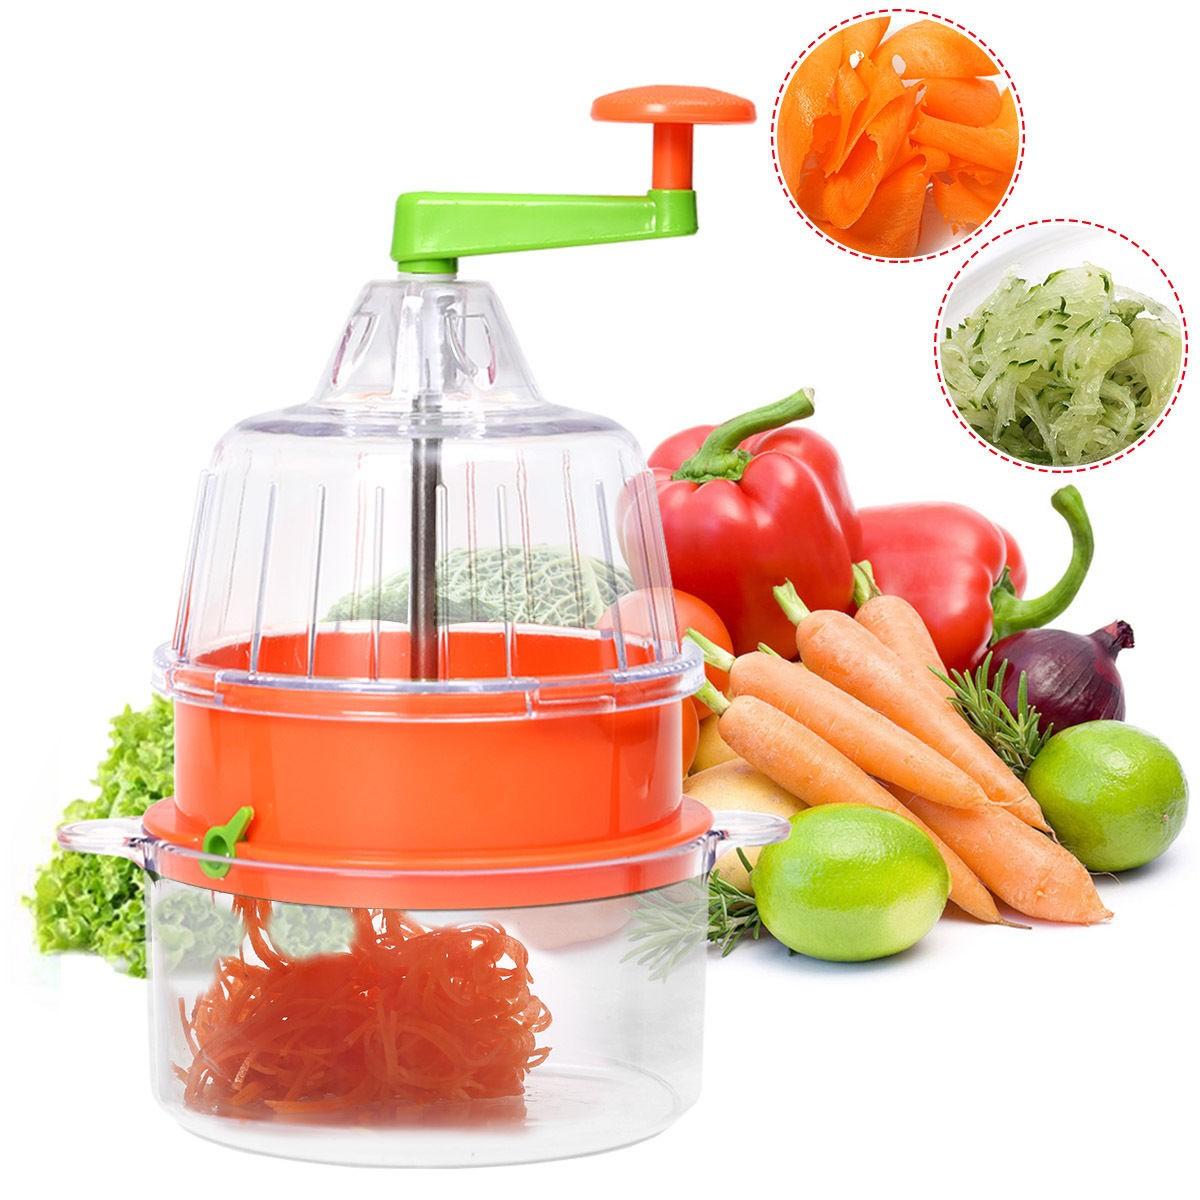 Costway Multifunctional Manual Spiral Vegetable Slicer Fruit Cutter $5.95 + Free Shipping